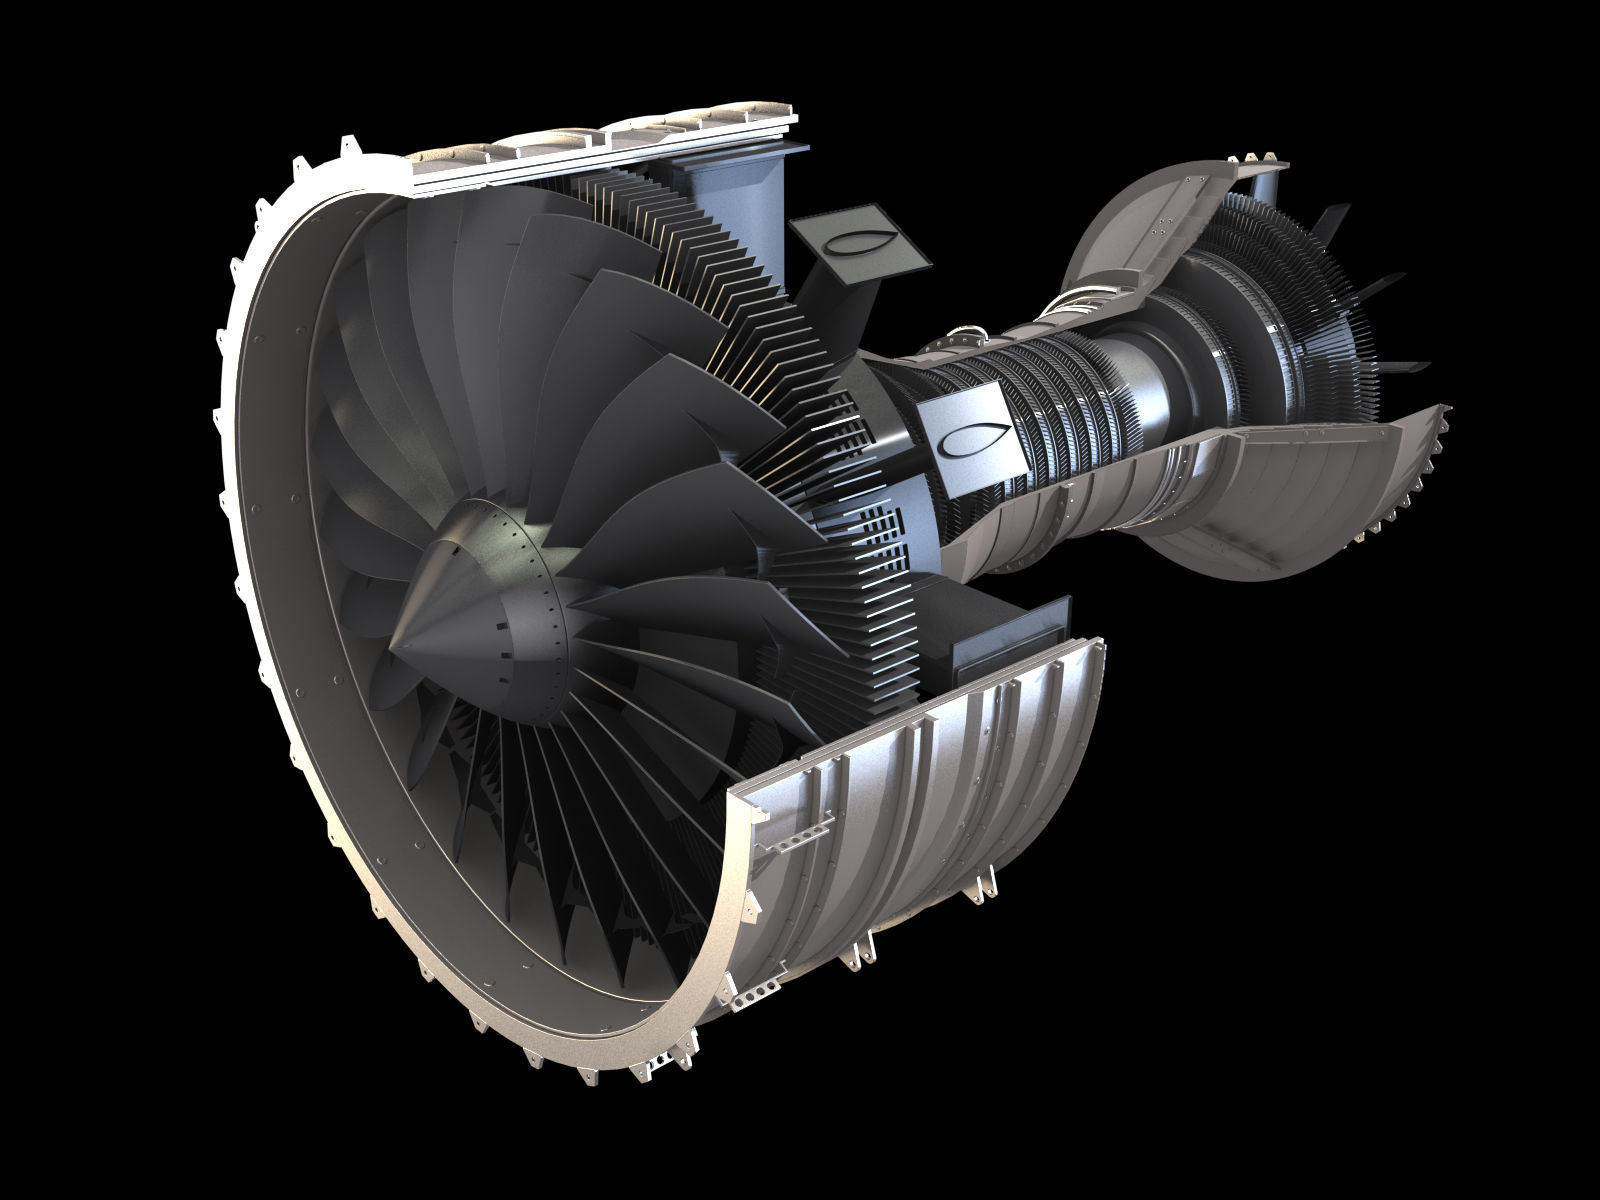 AIRCRAFT TURBOFAN ENGINE